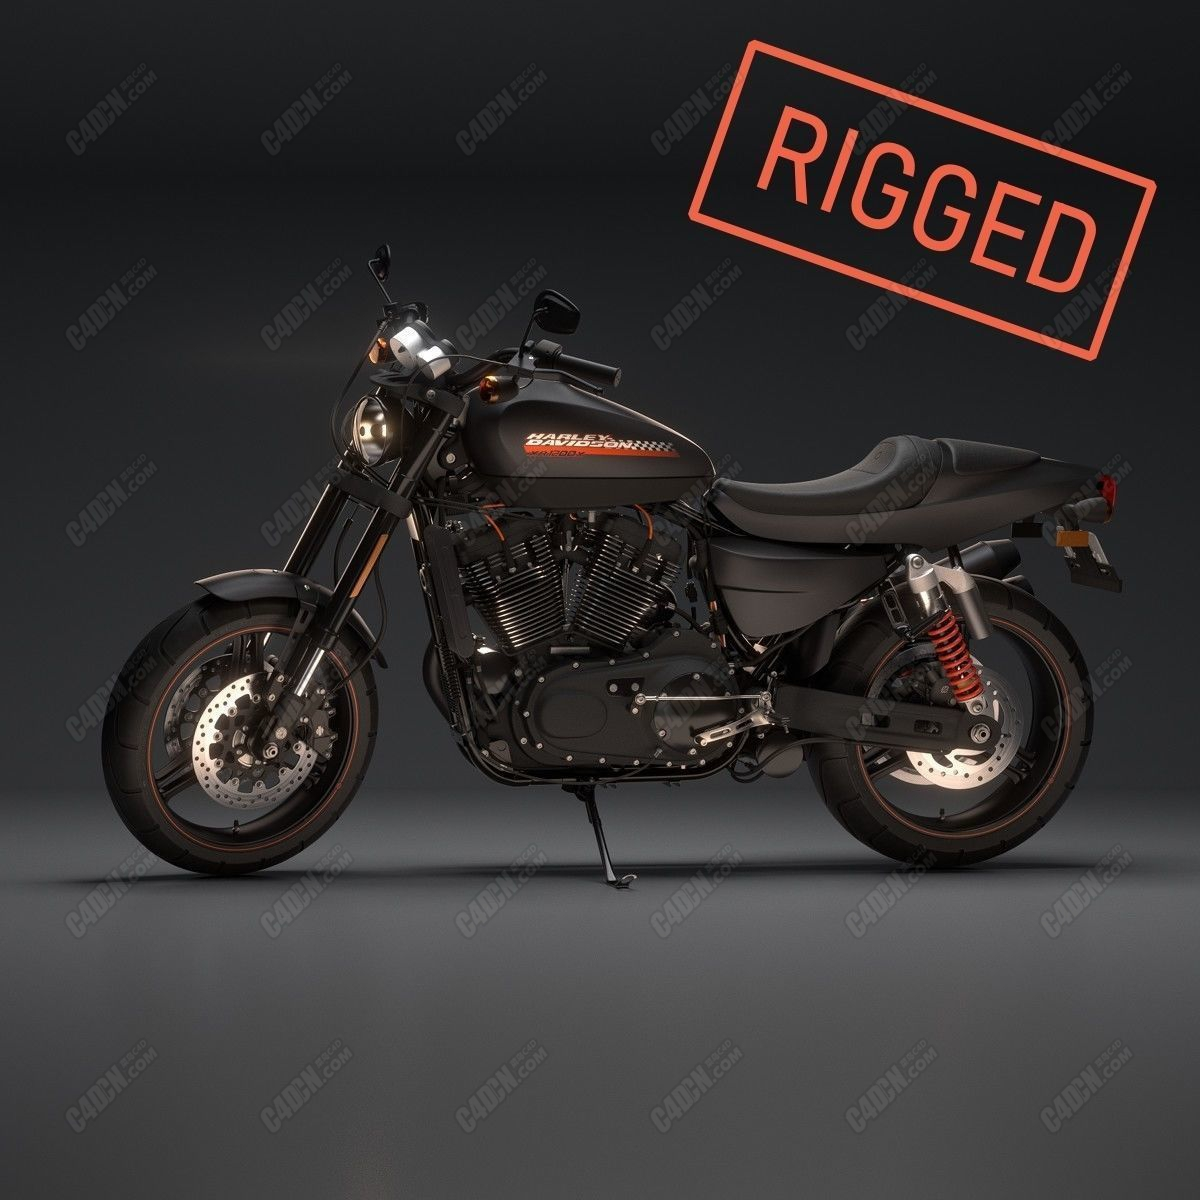 C4D汽车模型-哈雷戴维森XR1200X摩托车模型 Harley Davidson XR1200x Fu